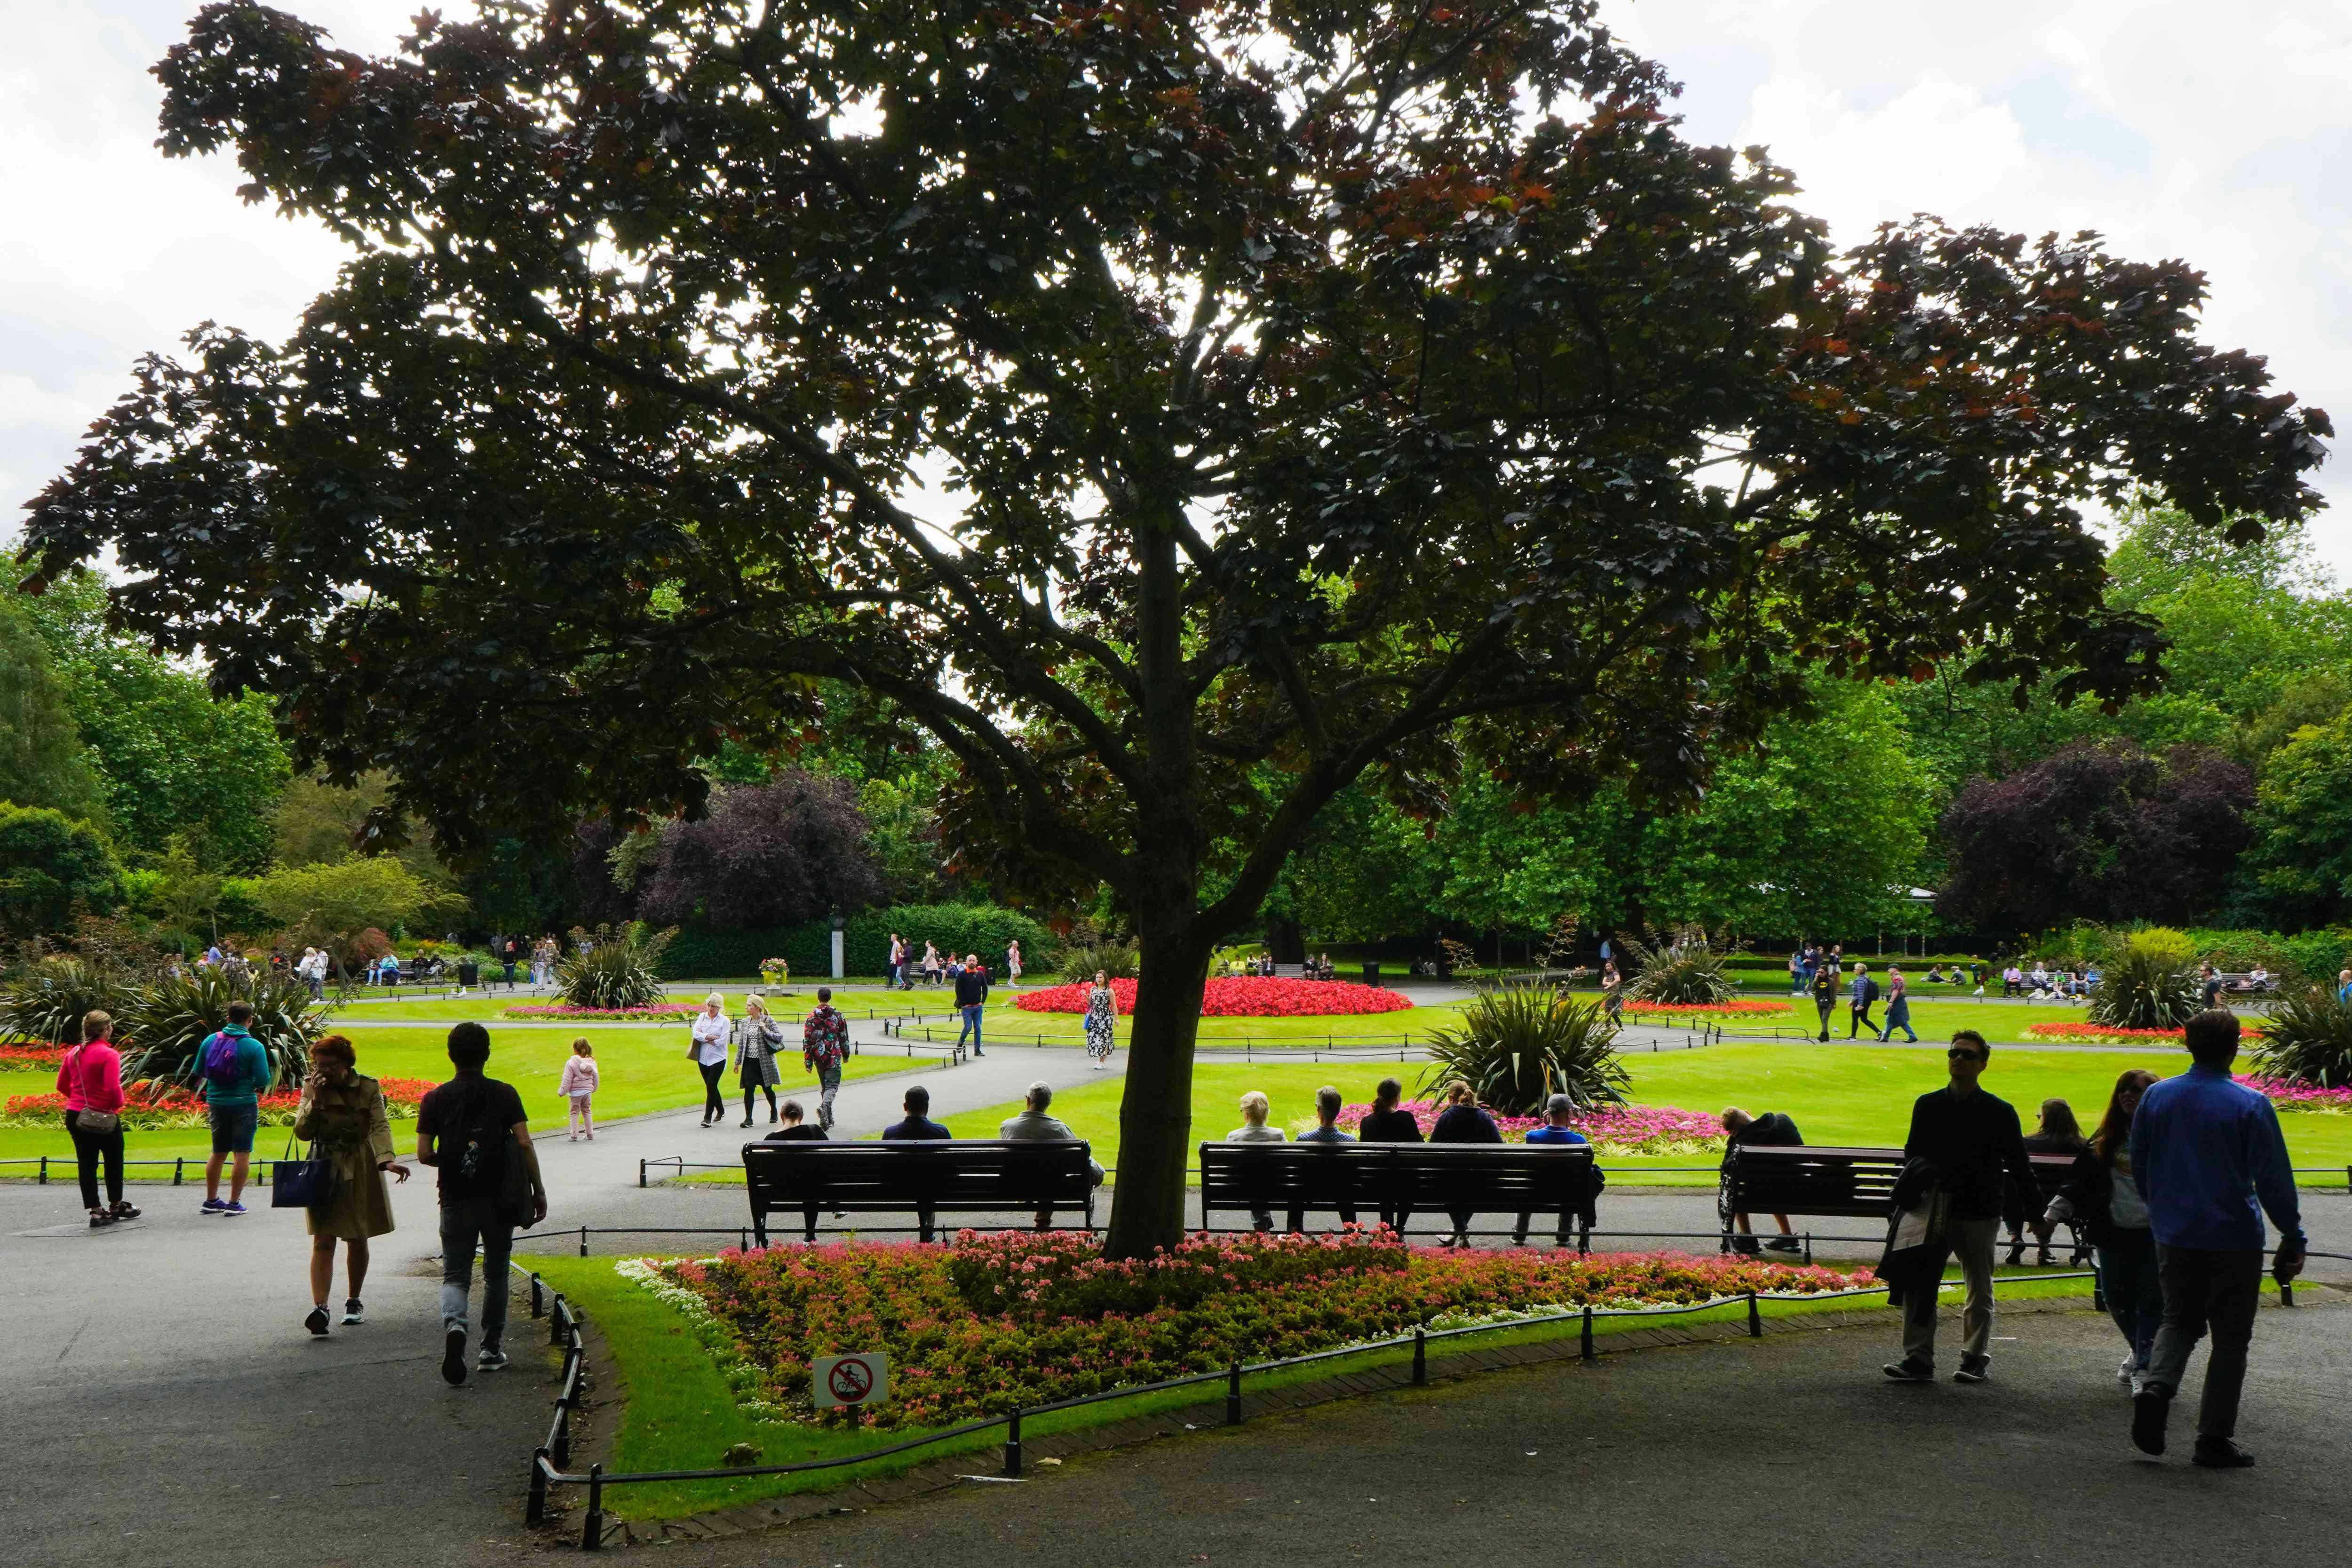 St. Stephen's Green in Dublin, Ireland